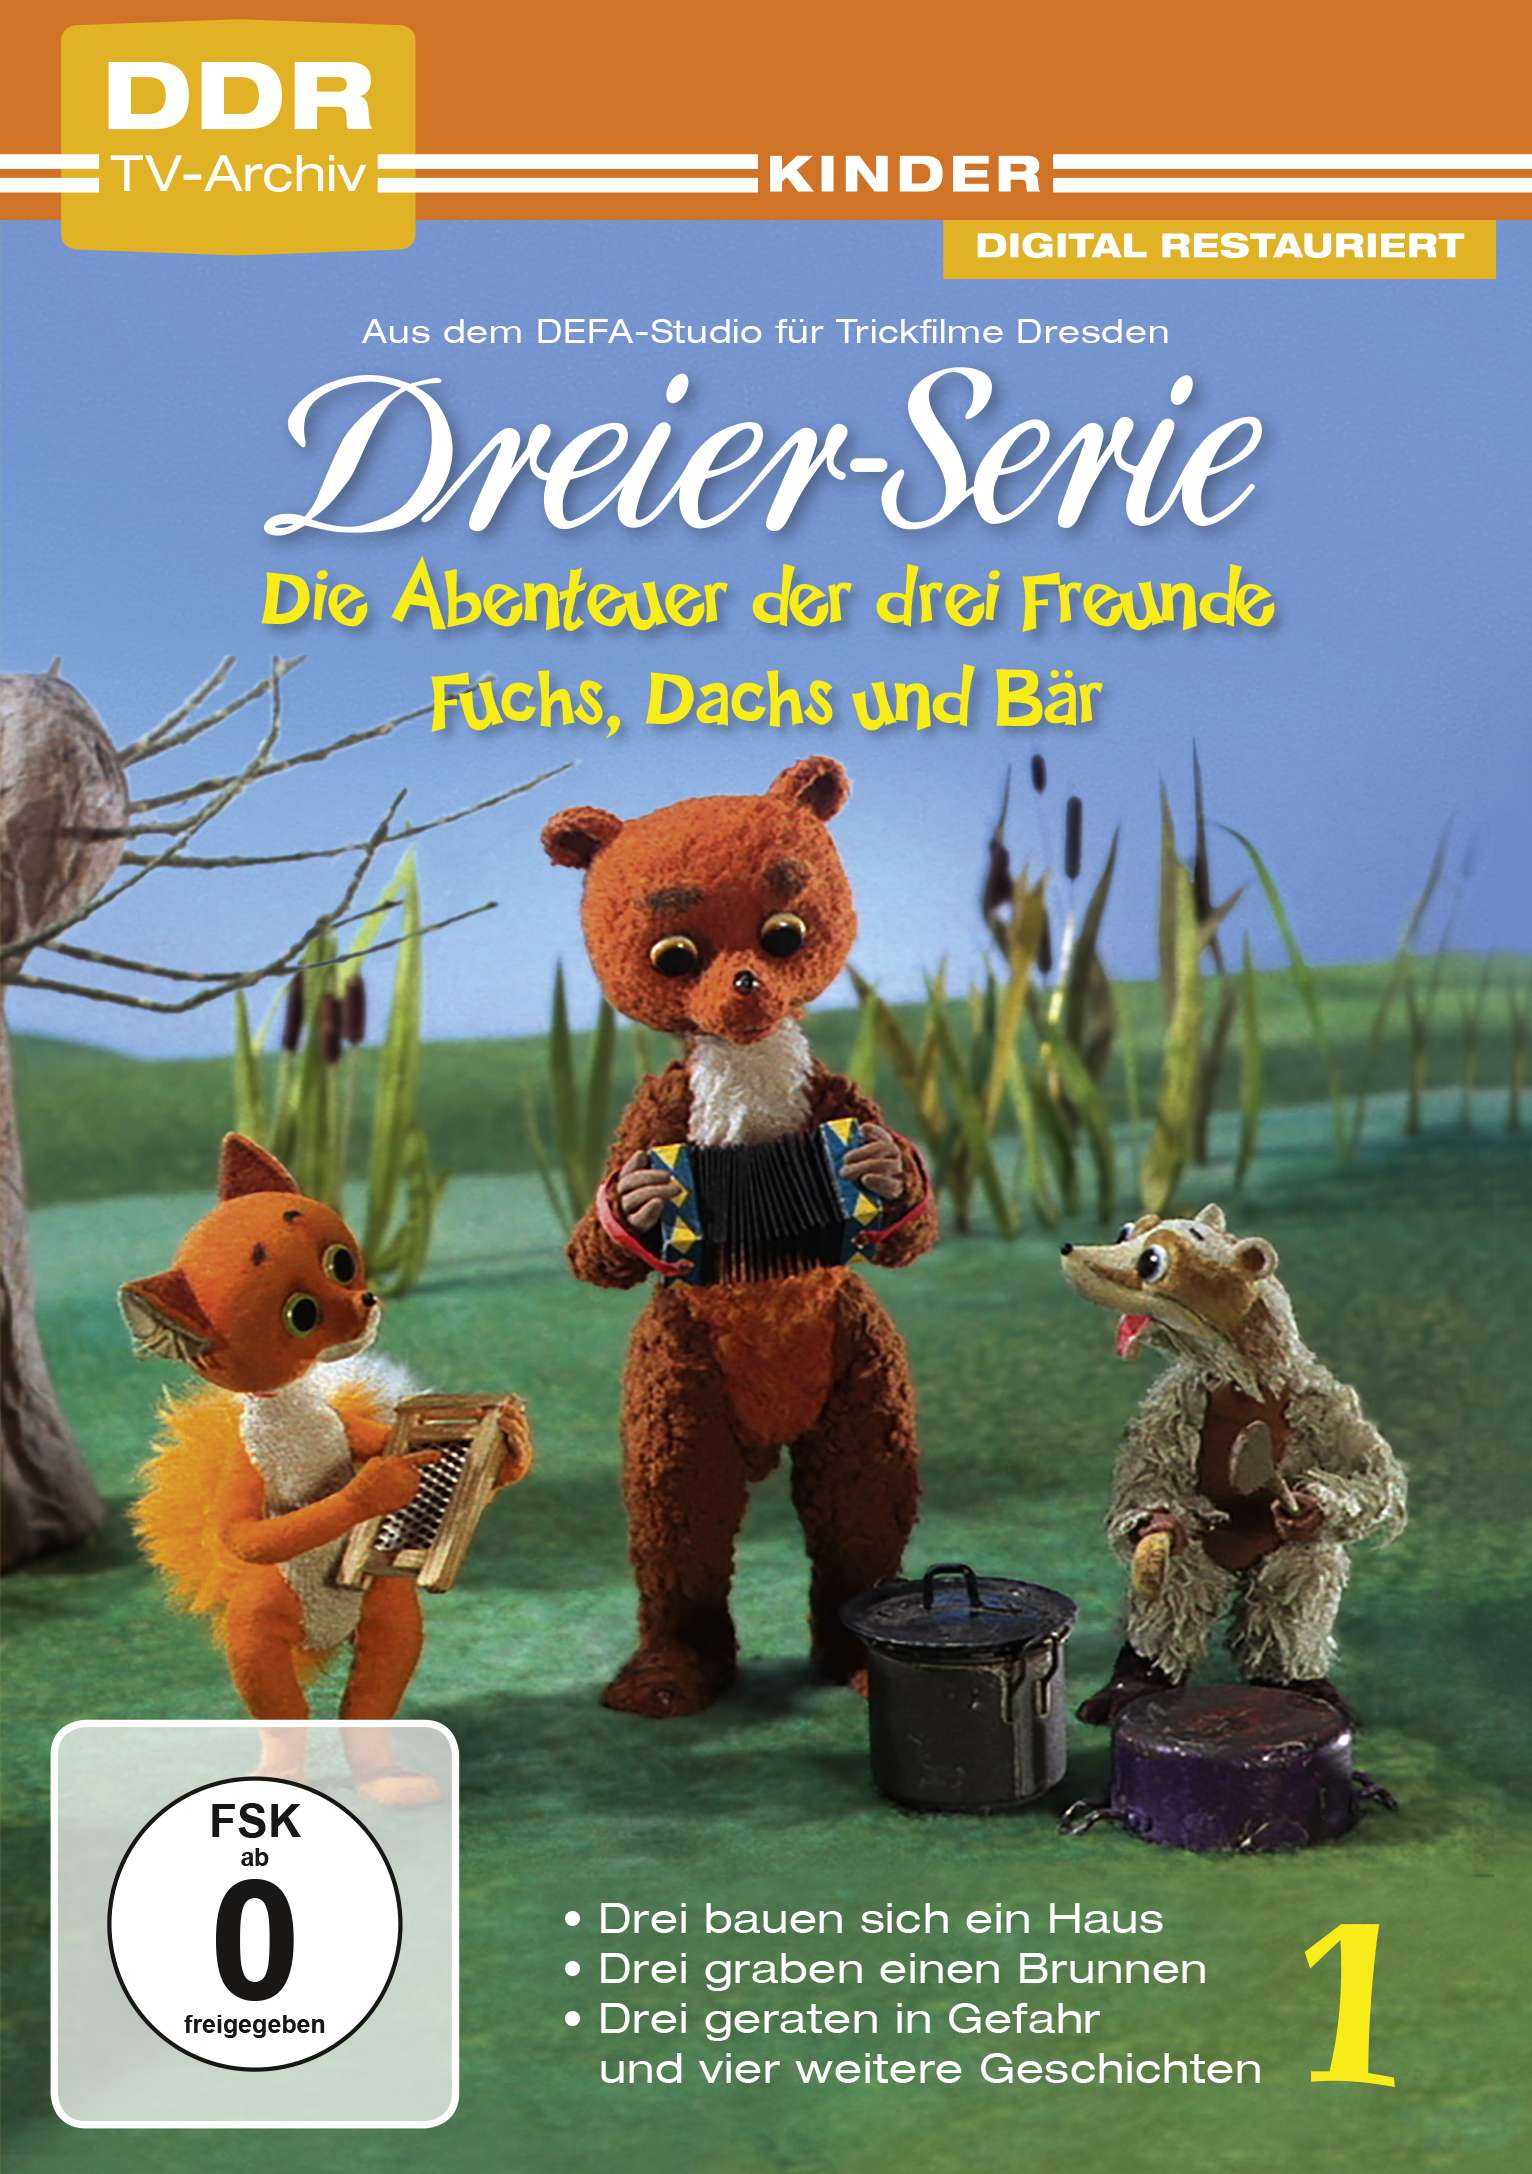 Dreier-Serier Vol. 1 (DVD) - DDR-TV-Archiv | rbb shop